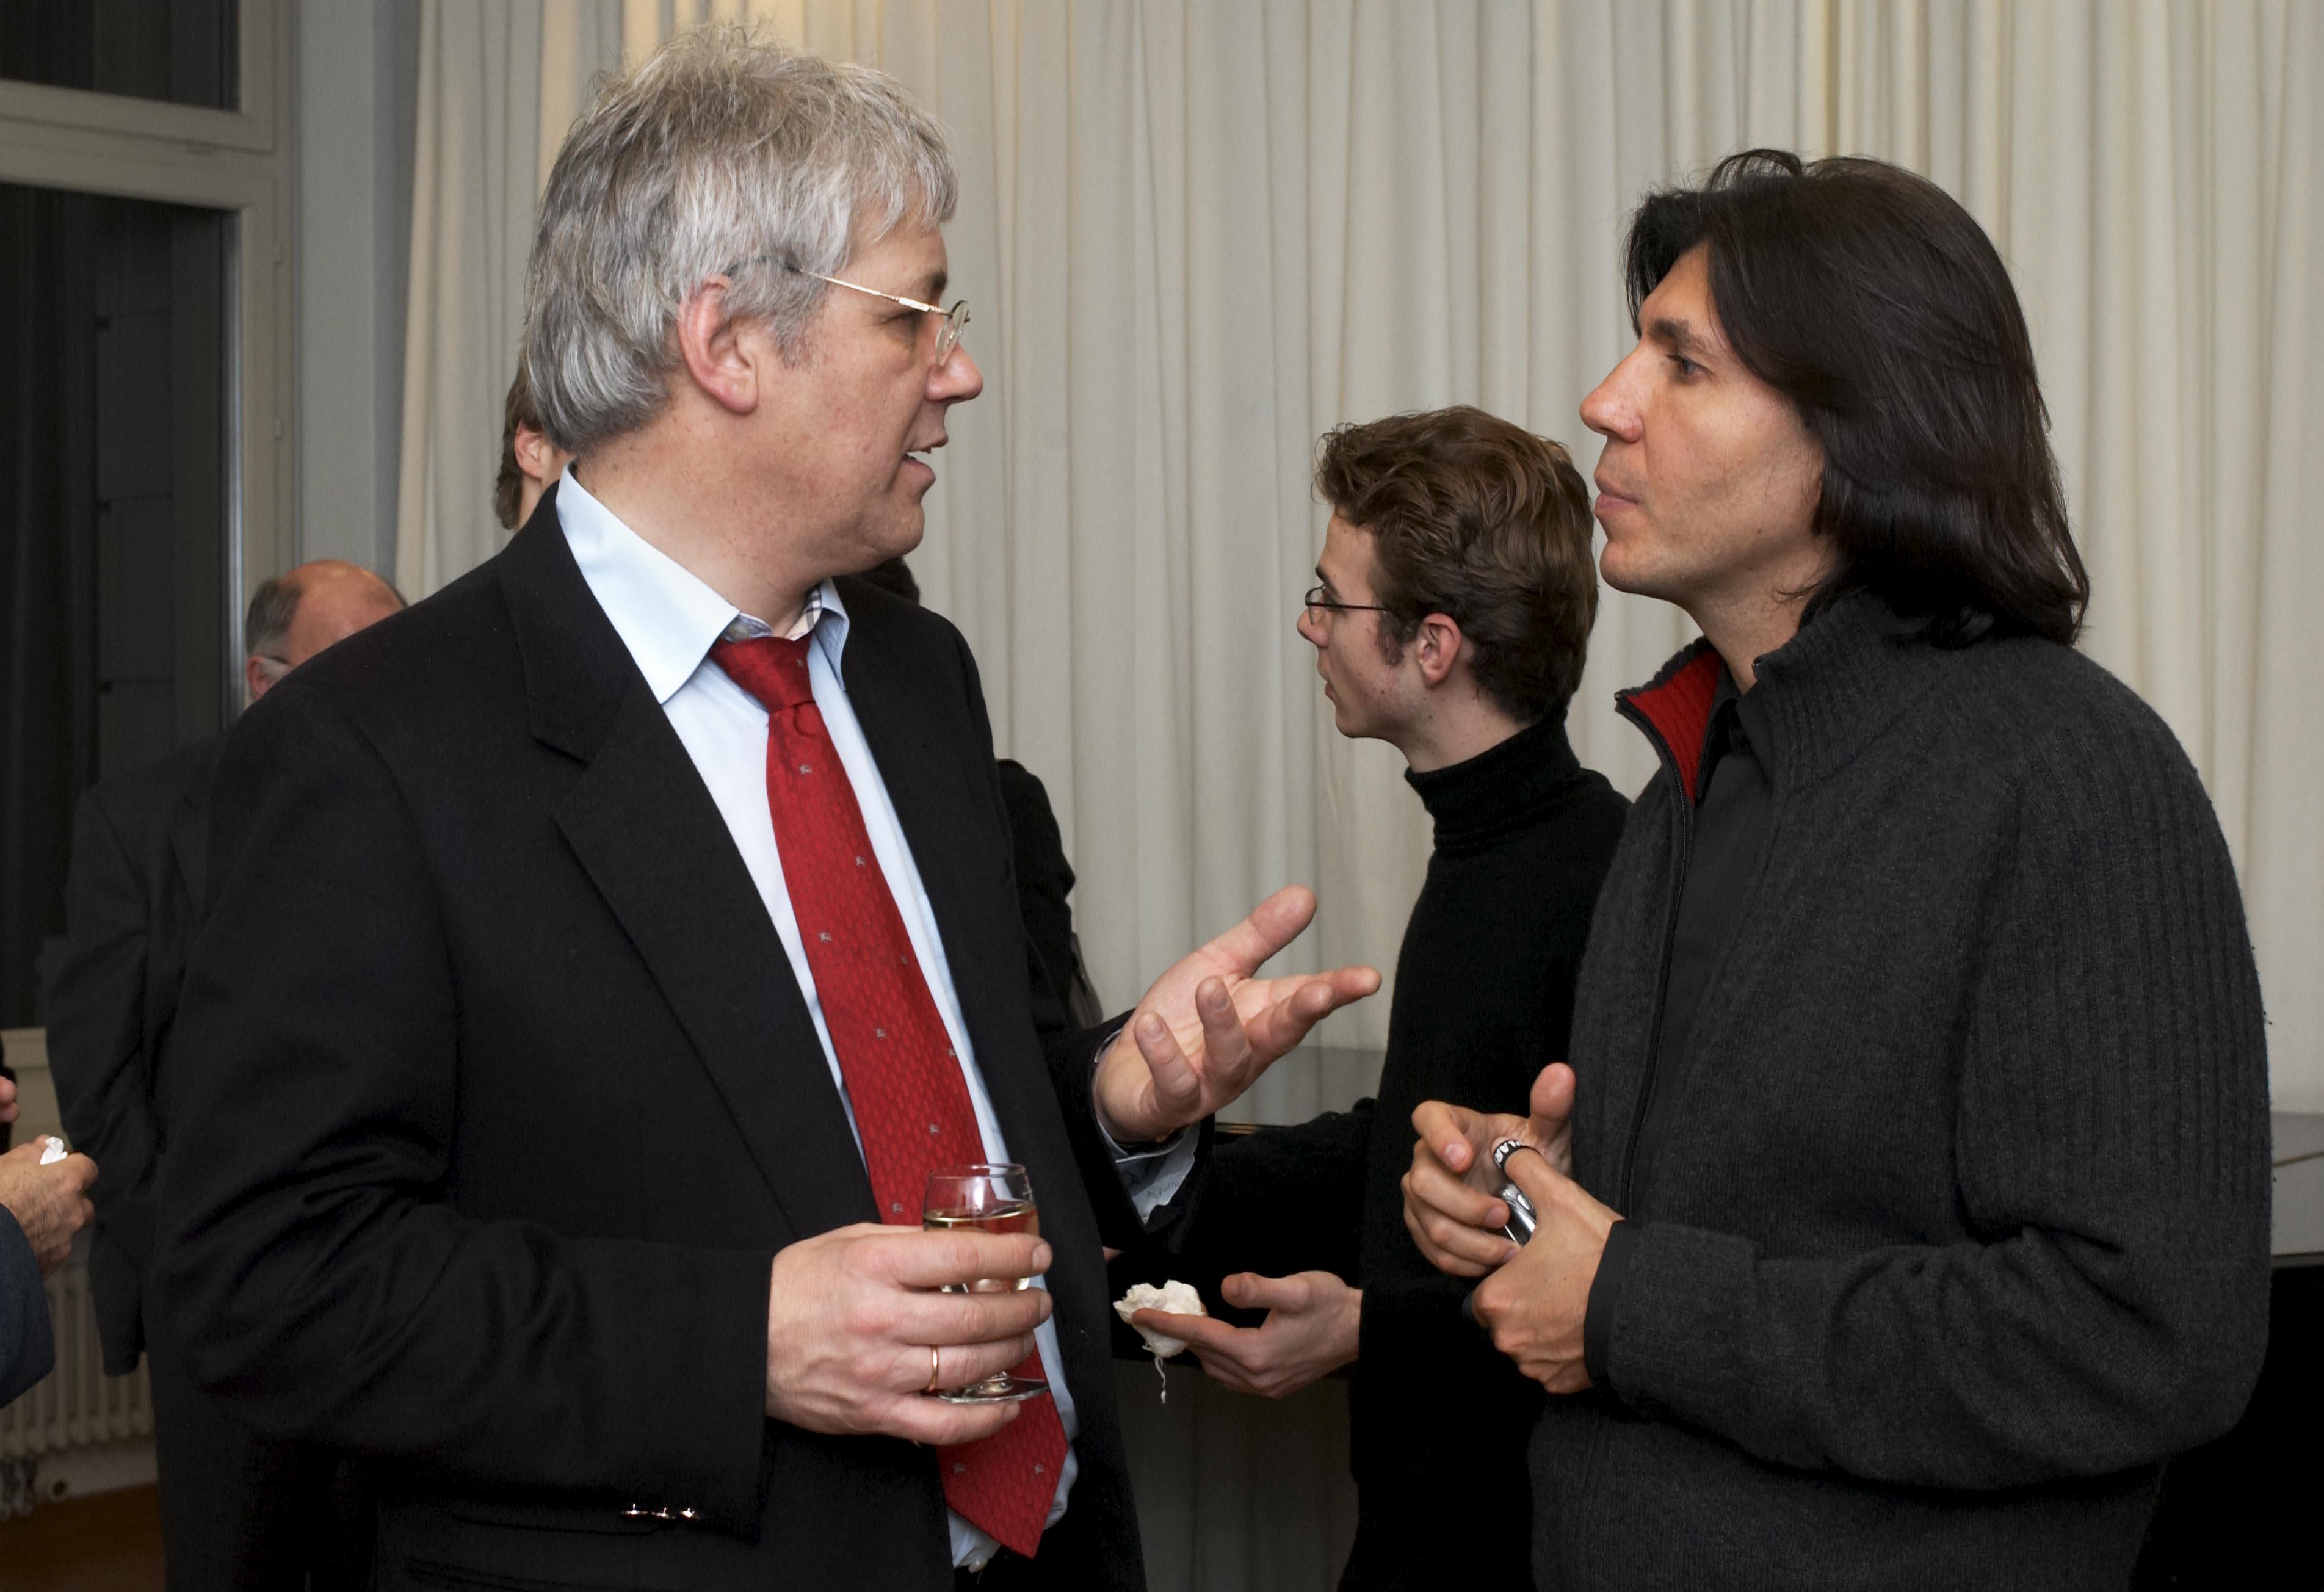 Rahn Musikpreis 2006, Johannes Degen und Ricardo Castro